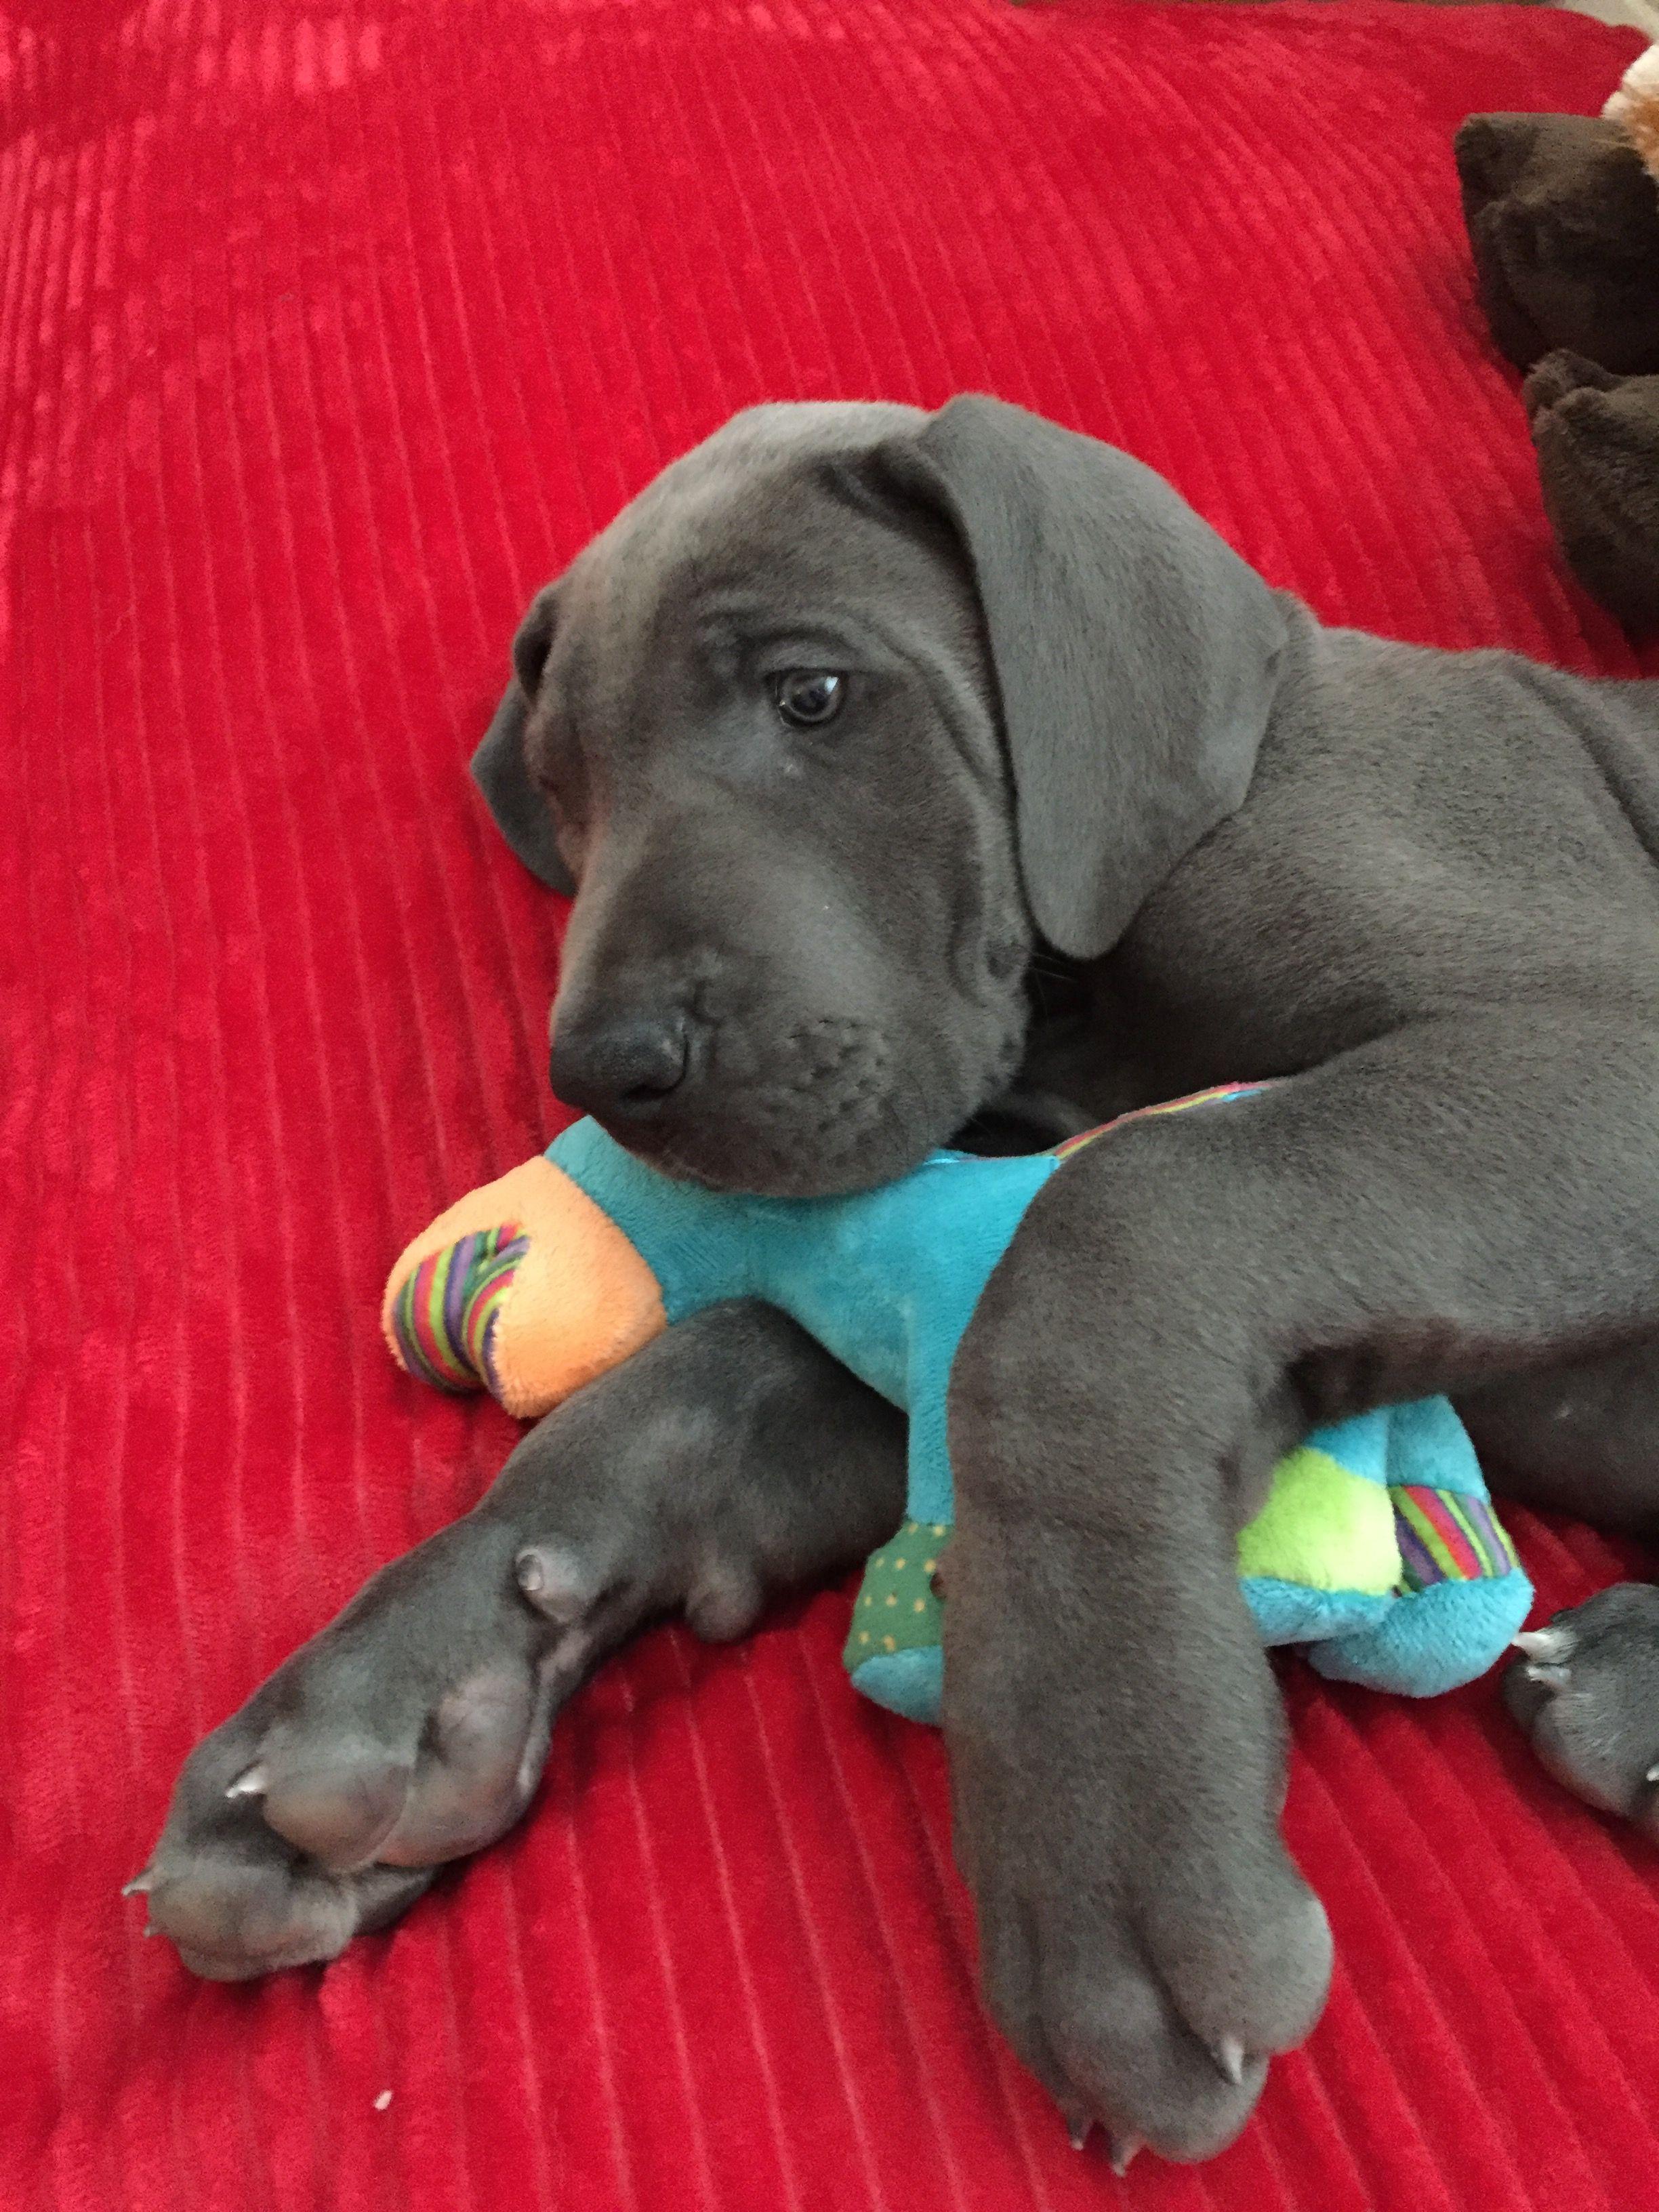 Judge The 8 Week Old Great Dane Great Dane Dogs Dog Friends